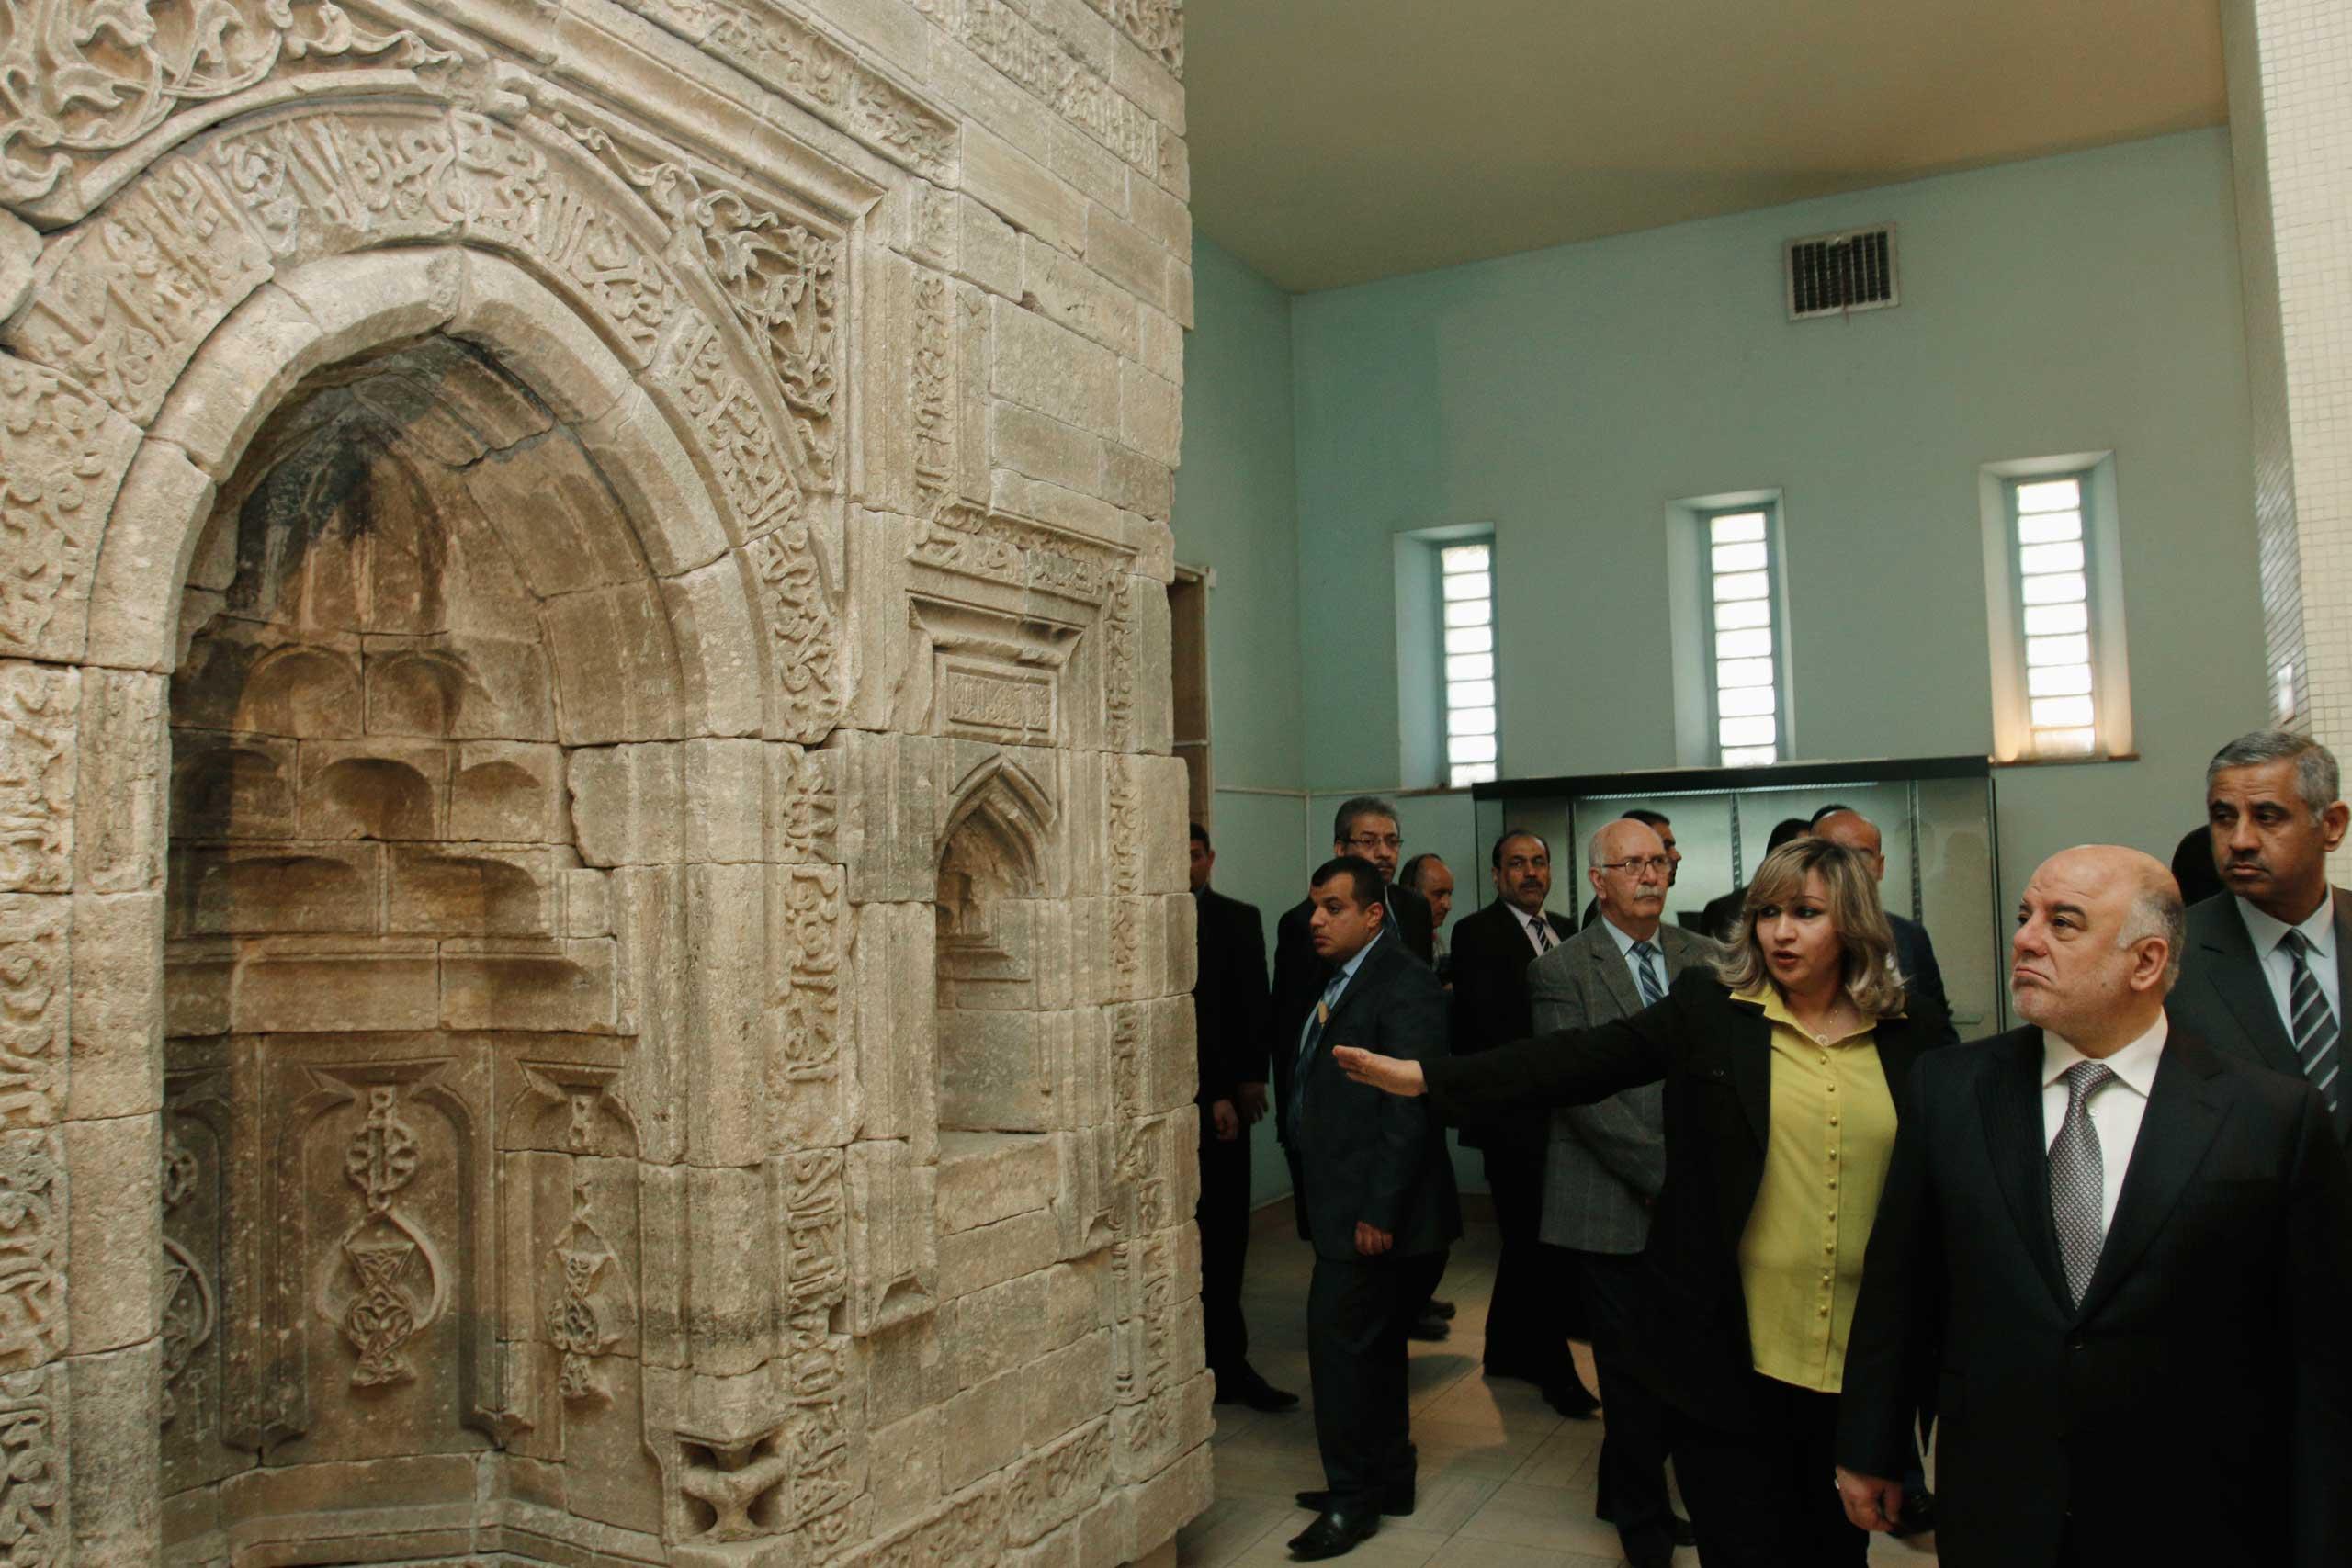 Iraqi Prime Minister Haider al-Abadi, right, visits the Iraqi National Museum in Baghdad Feb. 28, 2015.